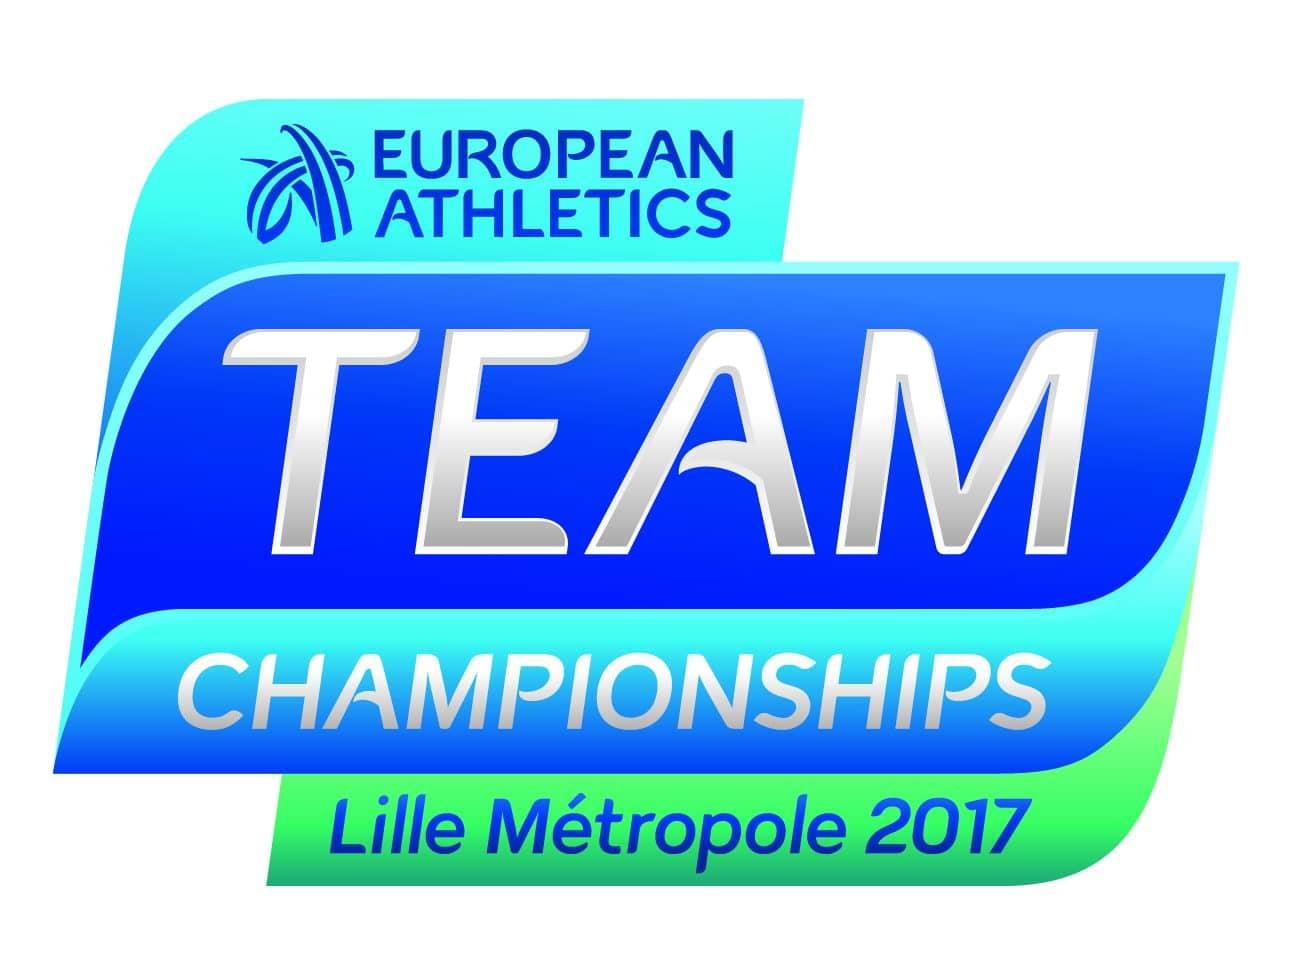 European athletics team championship 2017